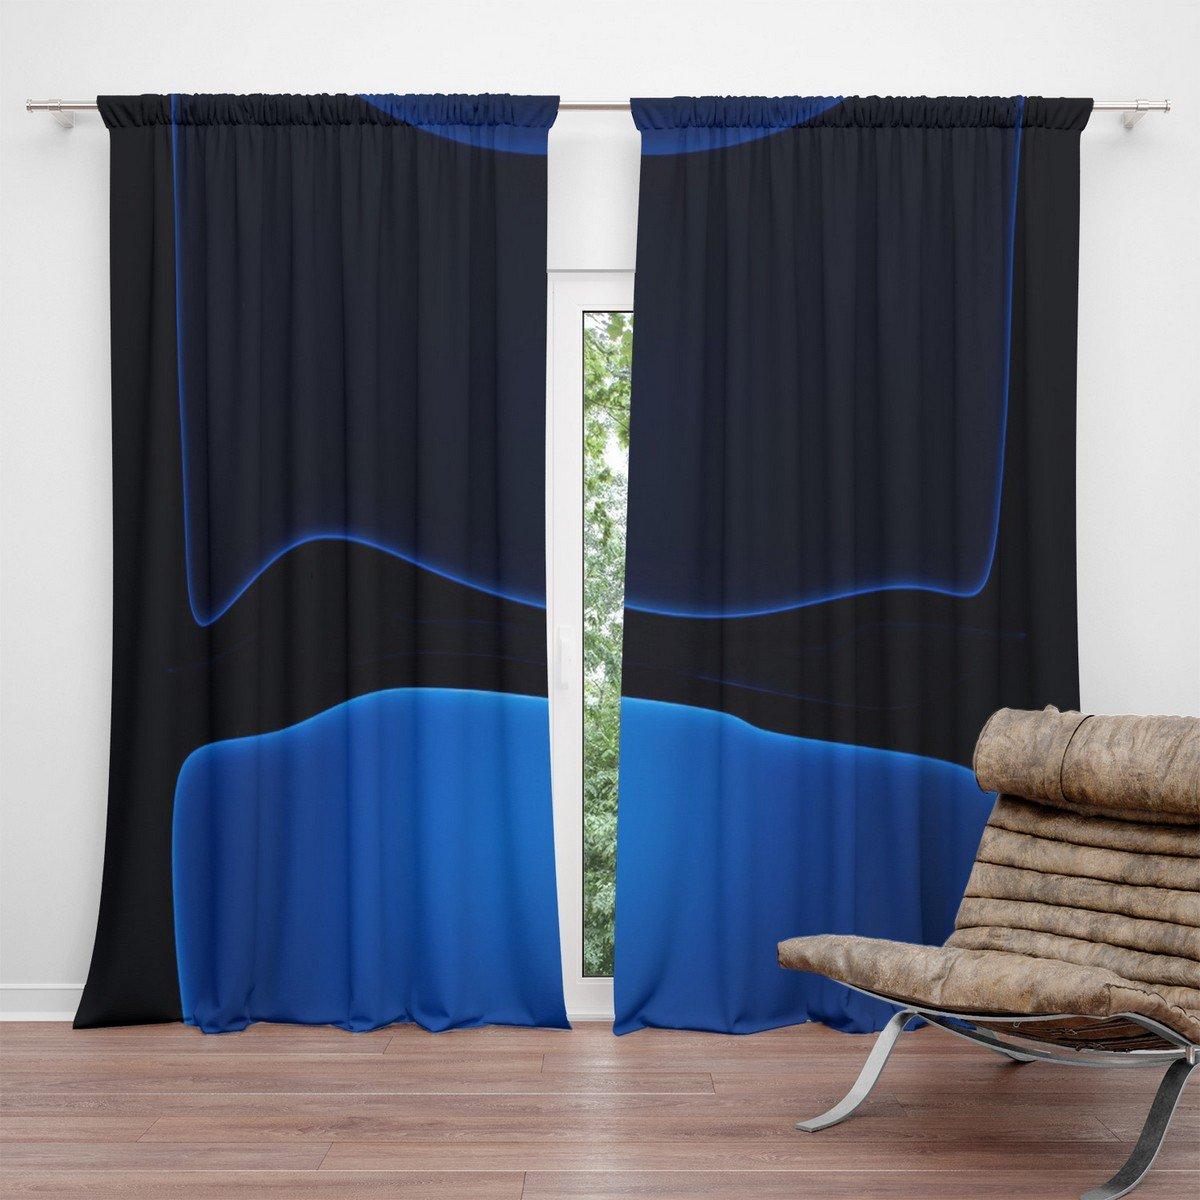 Ios 13 Dark Blue Blackout Curtains For Living Room Crush Curtain